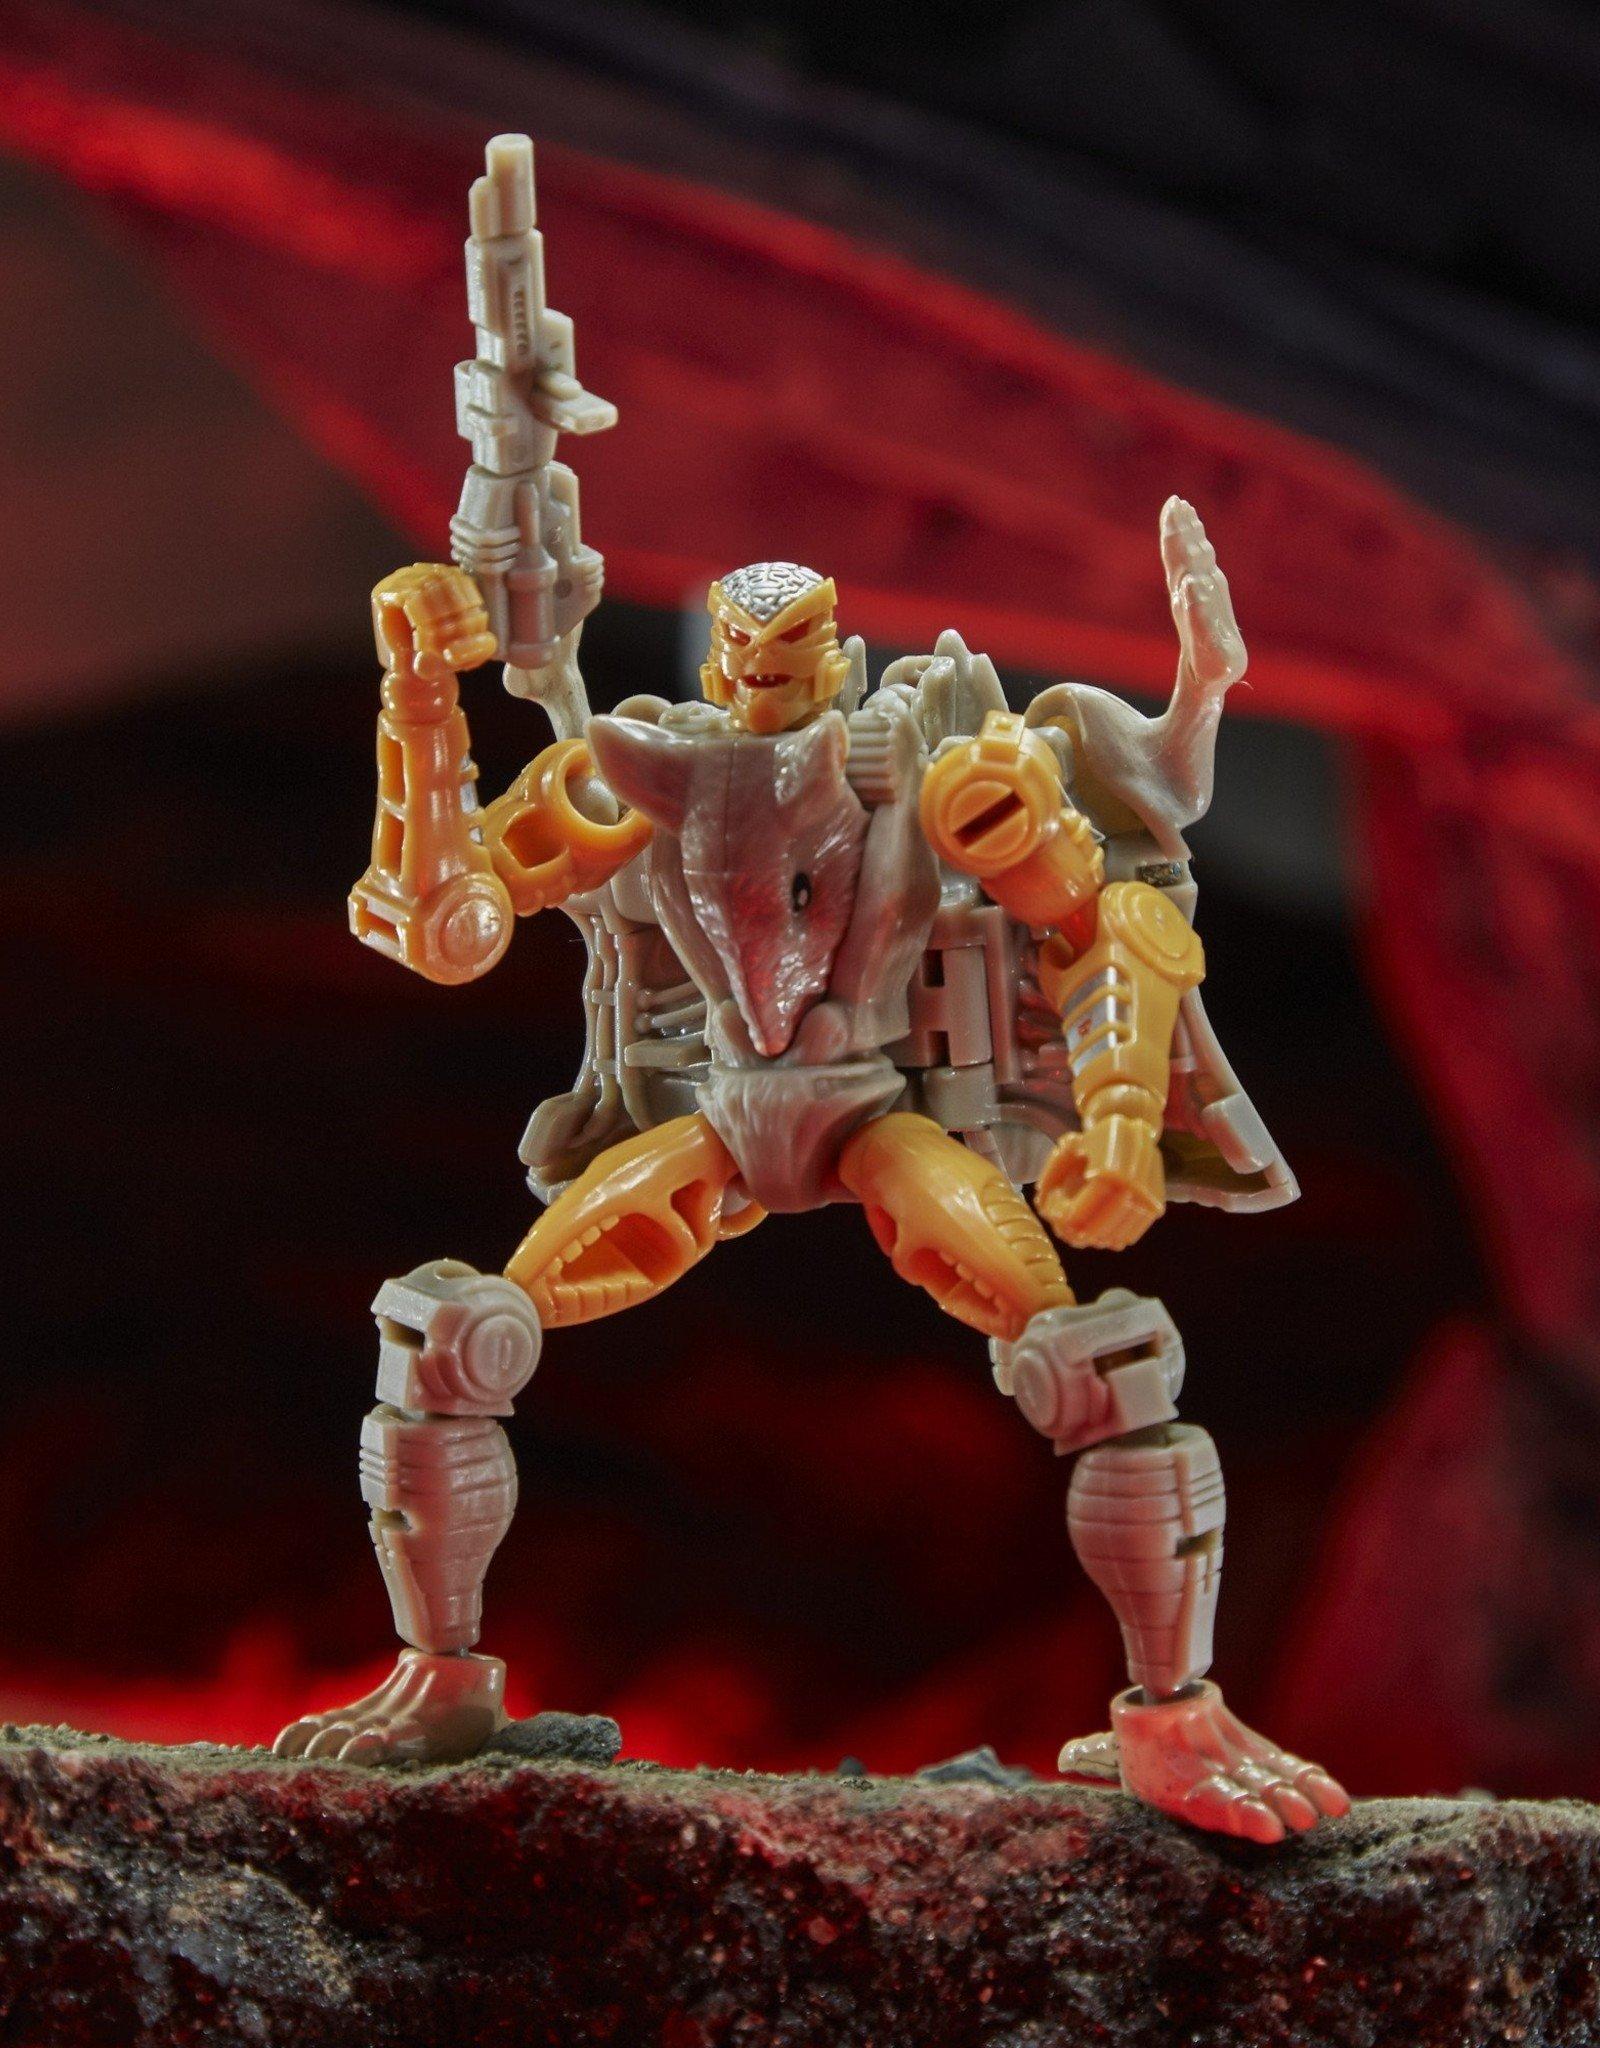 HASBRO Transformers Generations War for Cybertron: Kingdom Core Class WFC-K2 Rattrap